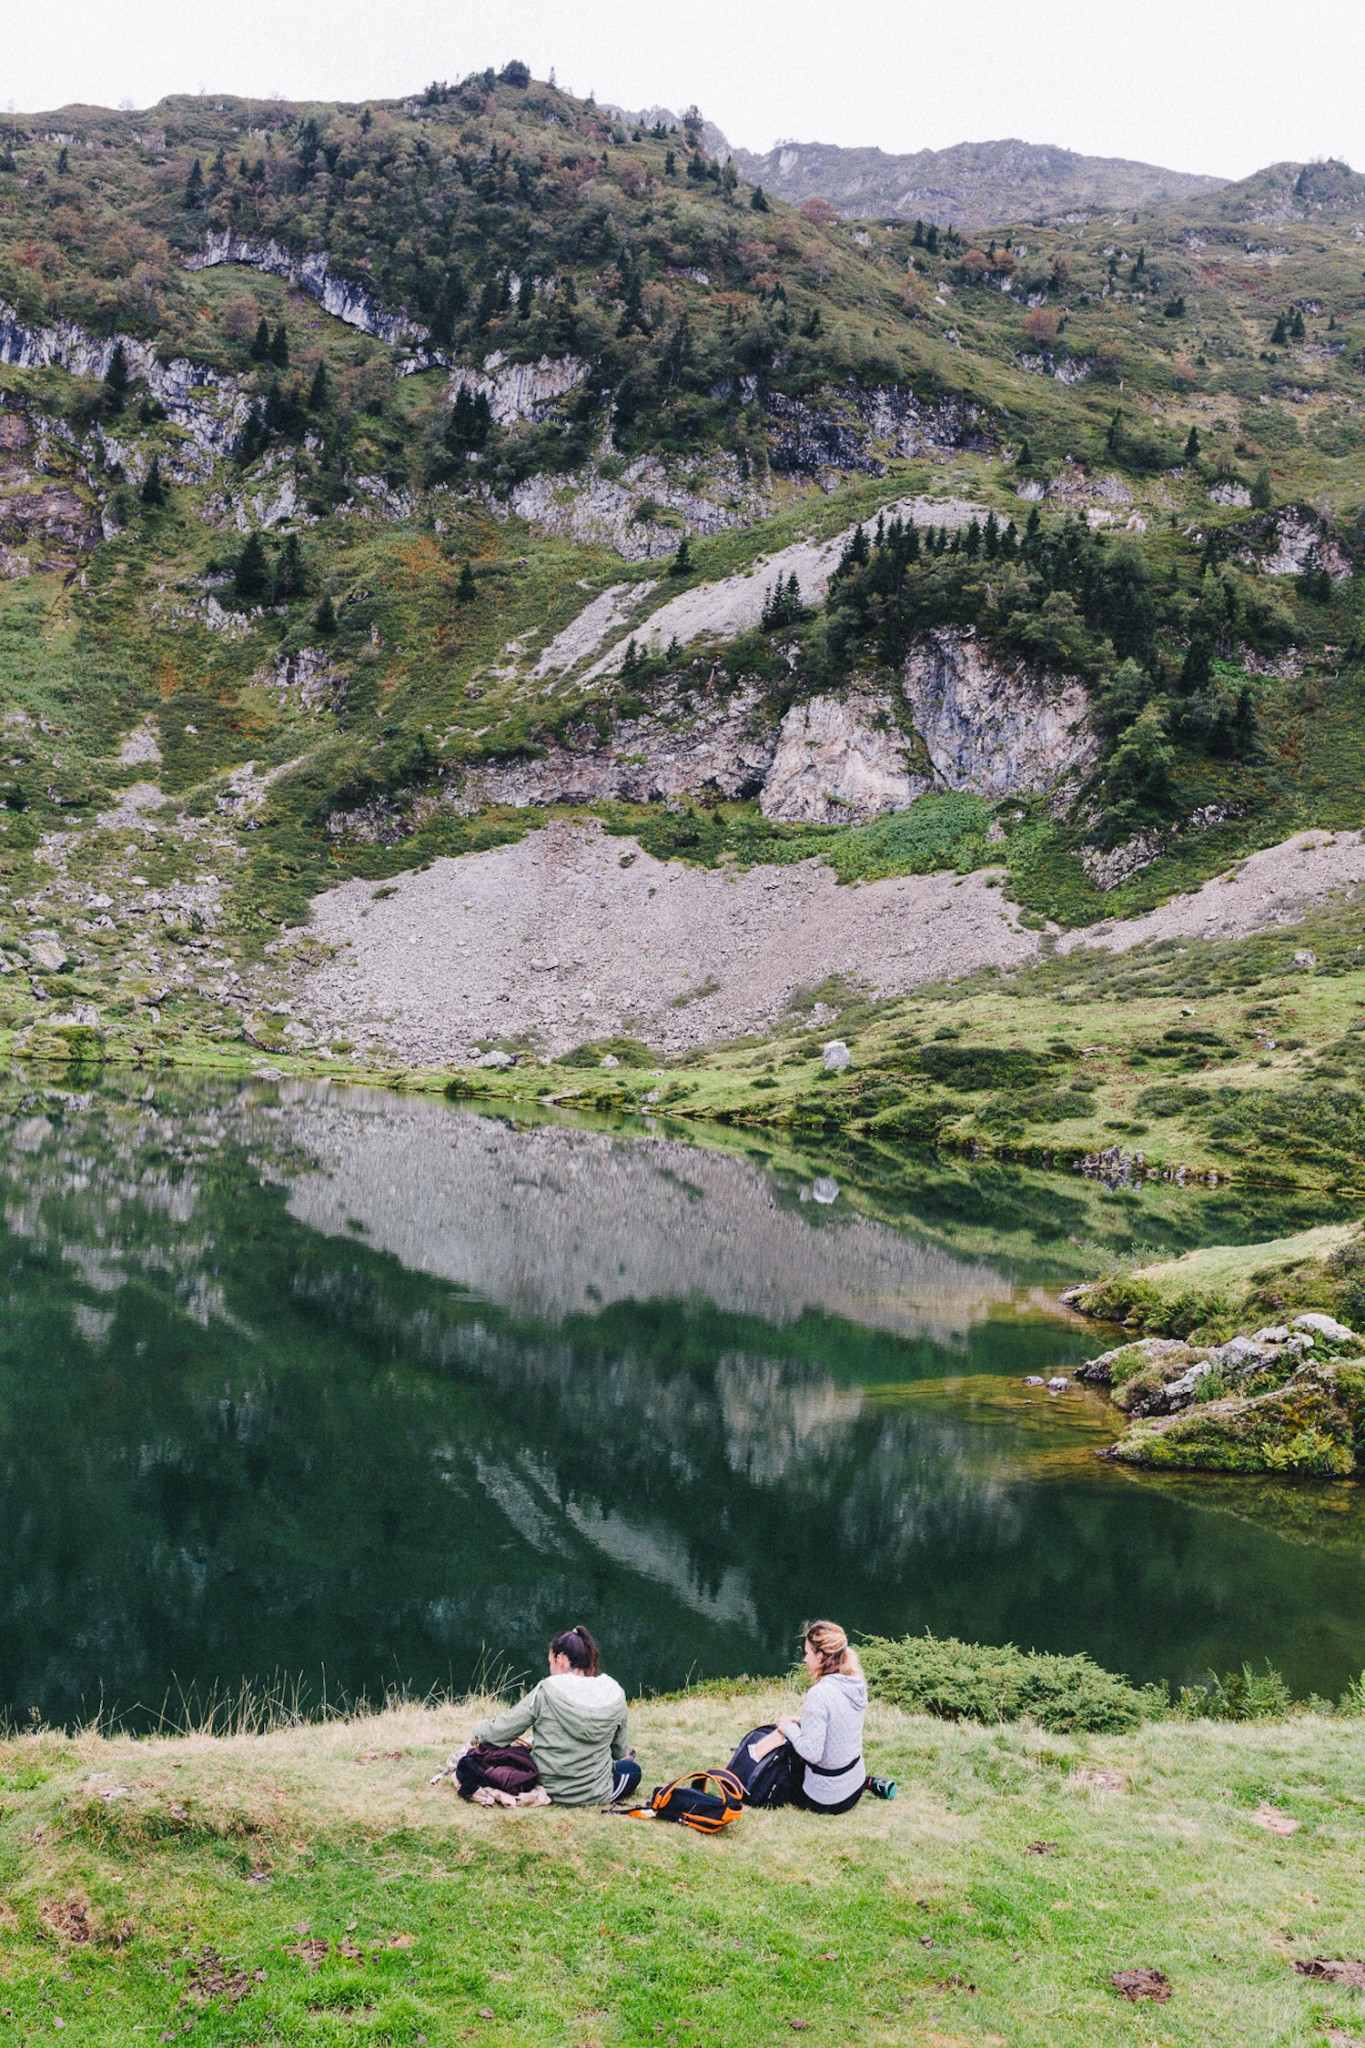 randonnee-au-lac-d-ayes-pyrenees-ariegeoises-rose-fushia-photographie093